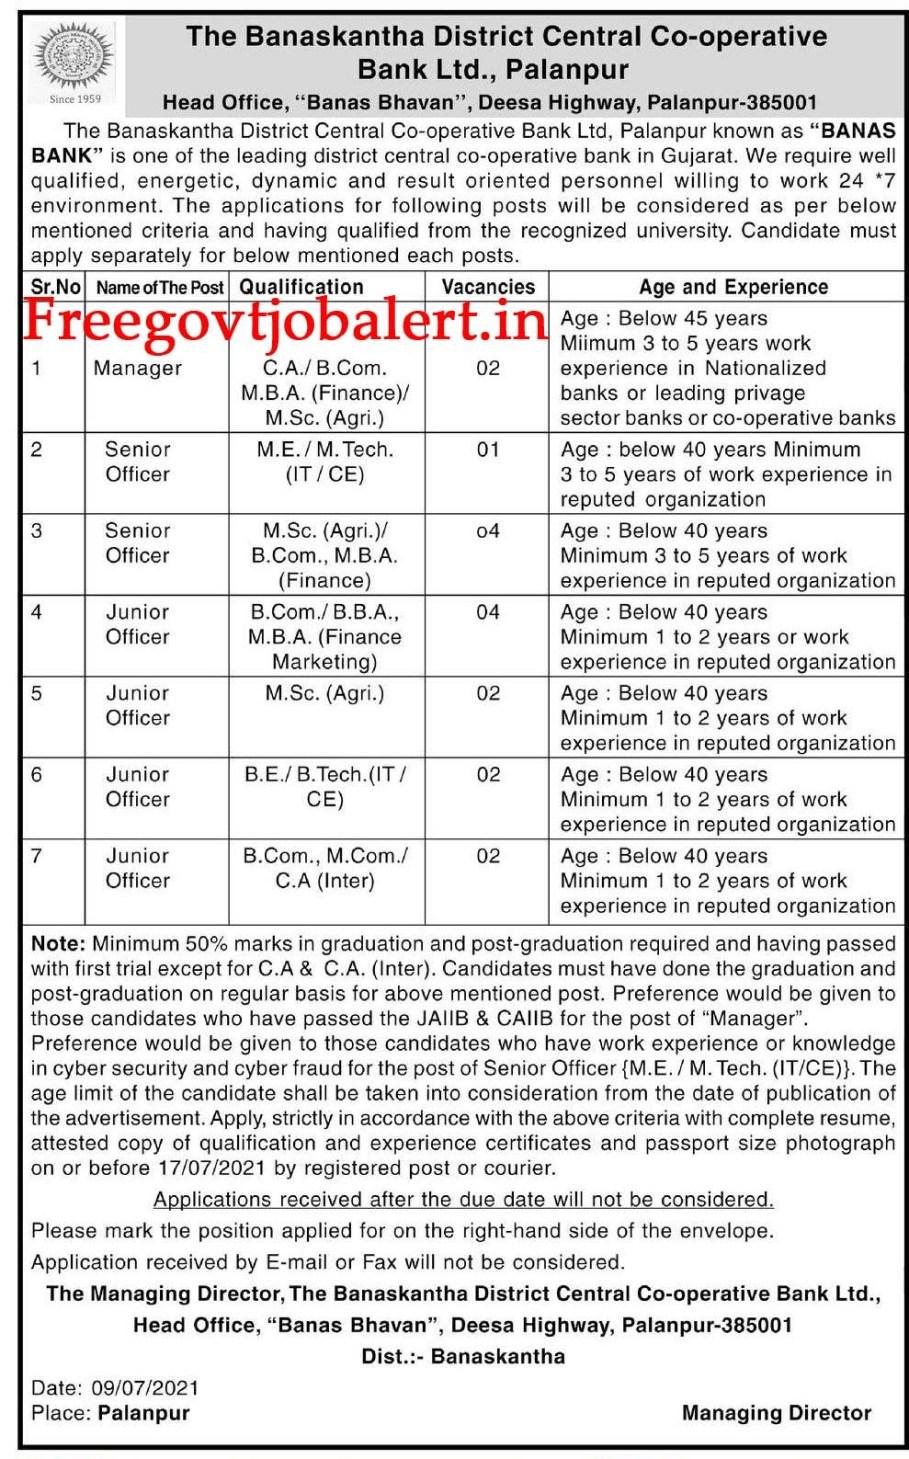 The Banaskantha District Central Co-operative Bank Ltd Recruitment 2021 - 17 Junior Officer & Manager Posts